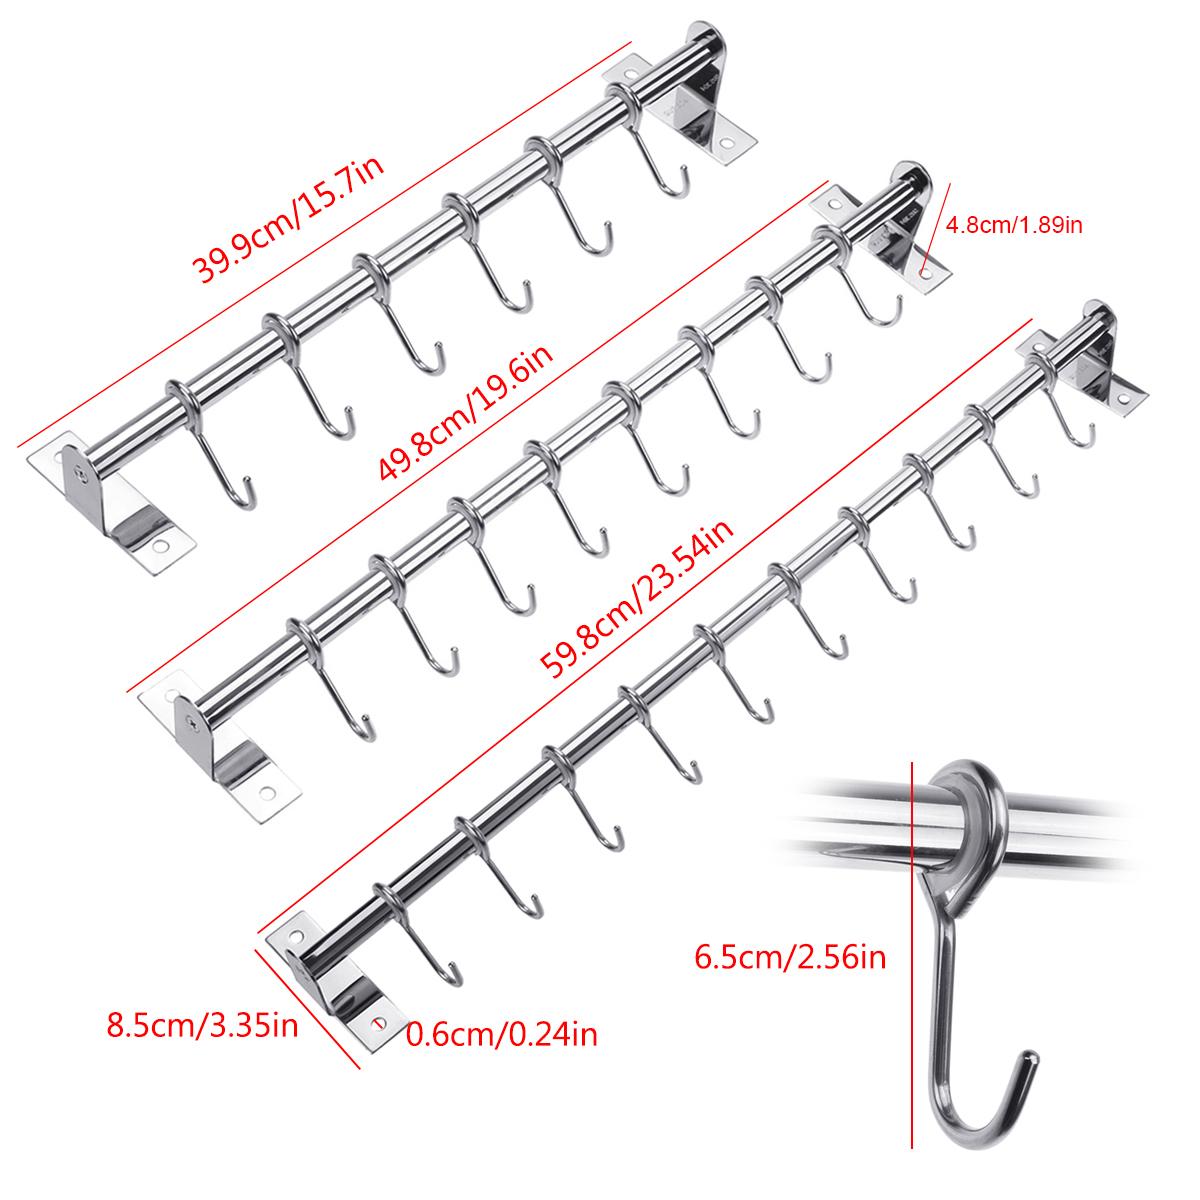 Wall Mount Stainless Steel Kitchen Rail Hanger Hooks Organizer Utensil Storage Holder Rack Bathroom